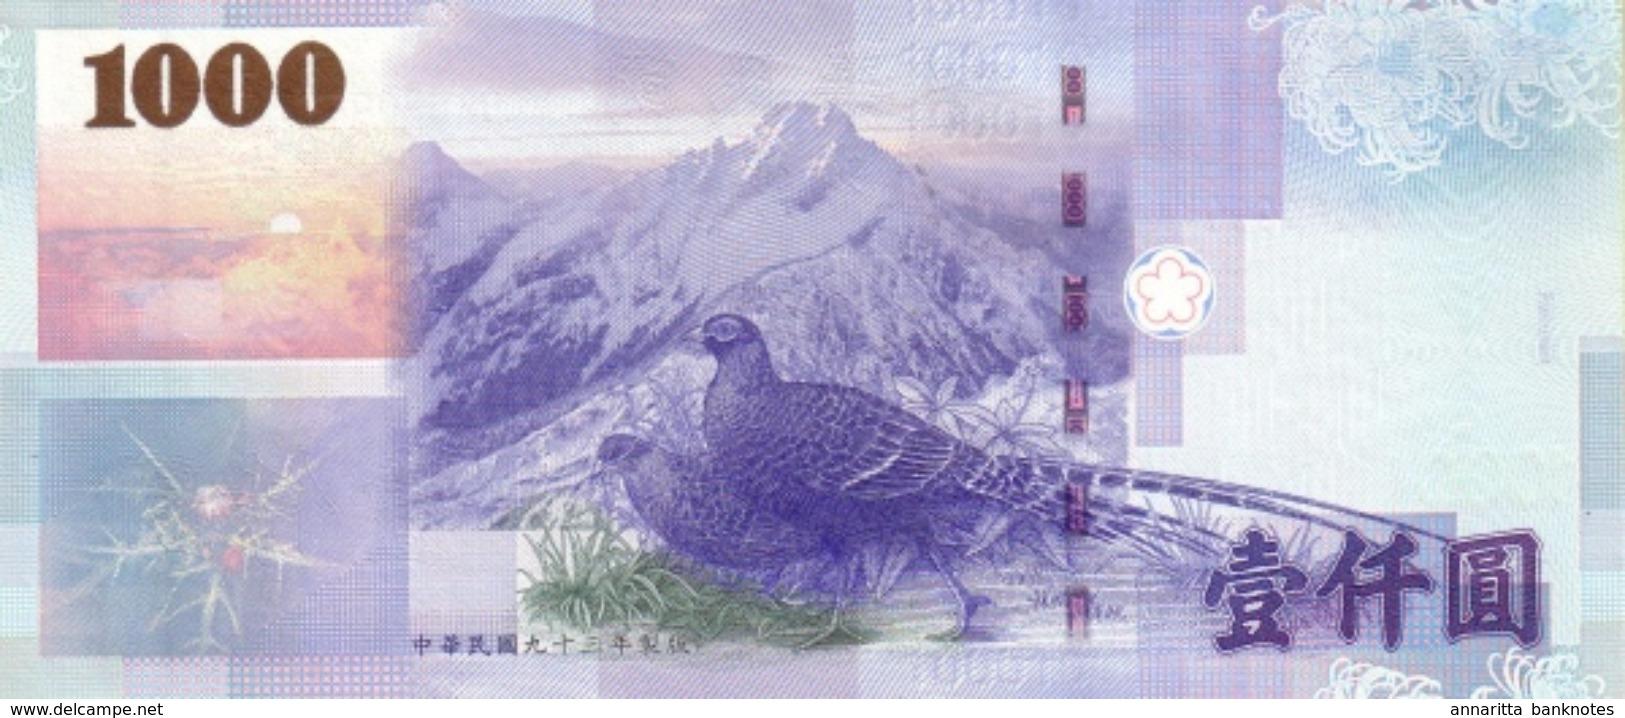 TAIWAN 1000 YUAN 2004 P-1997a UNC [TW506a] - Taiwan